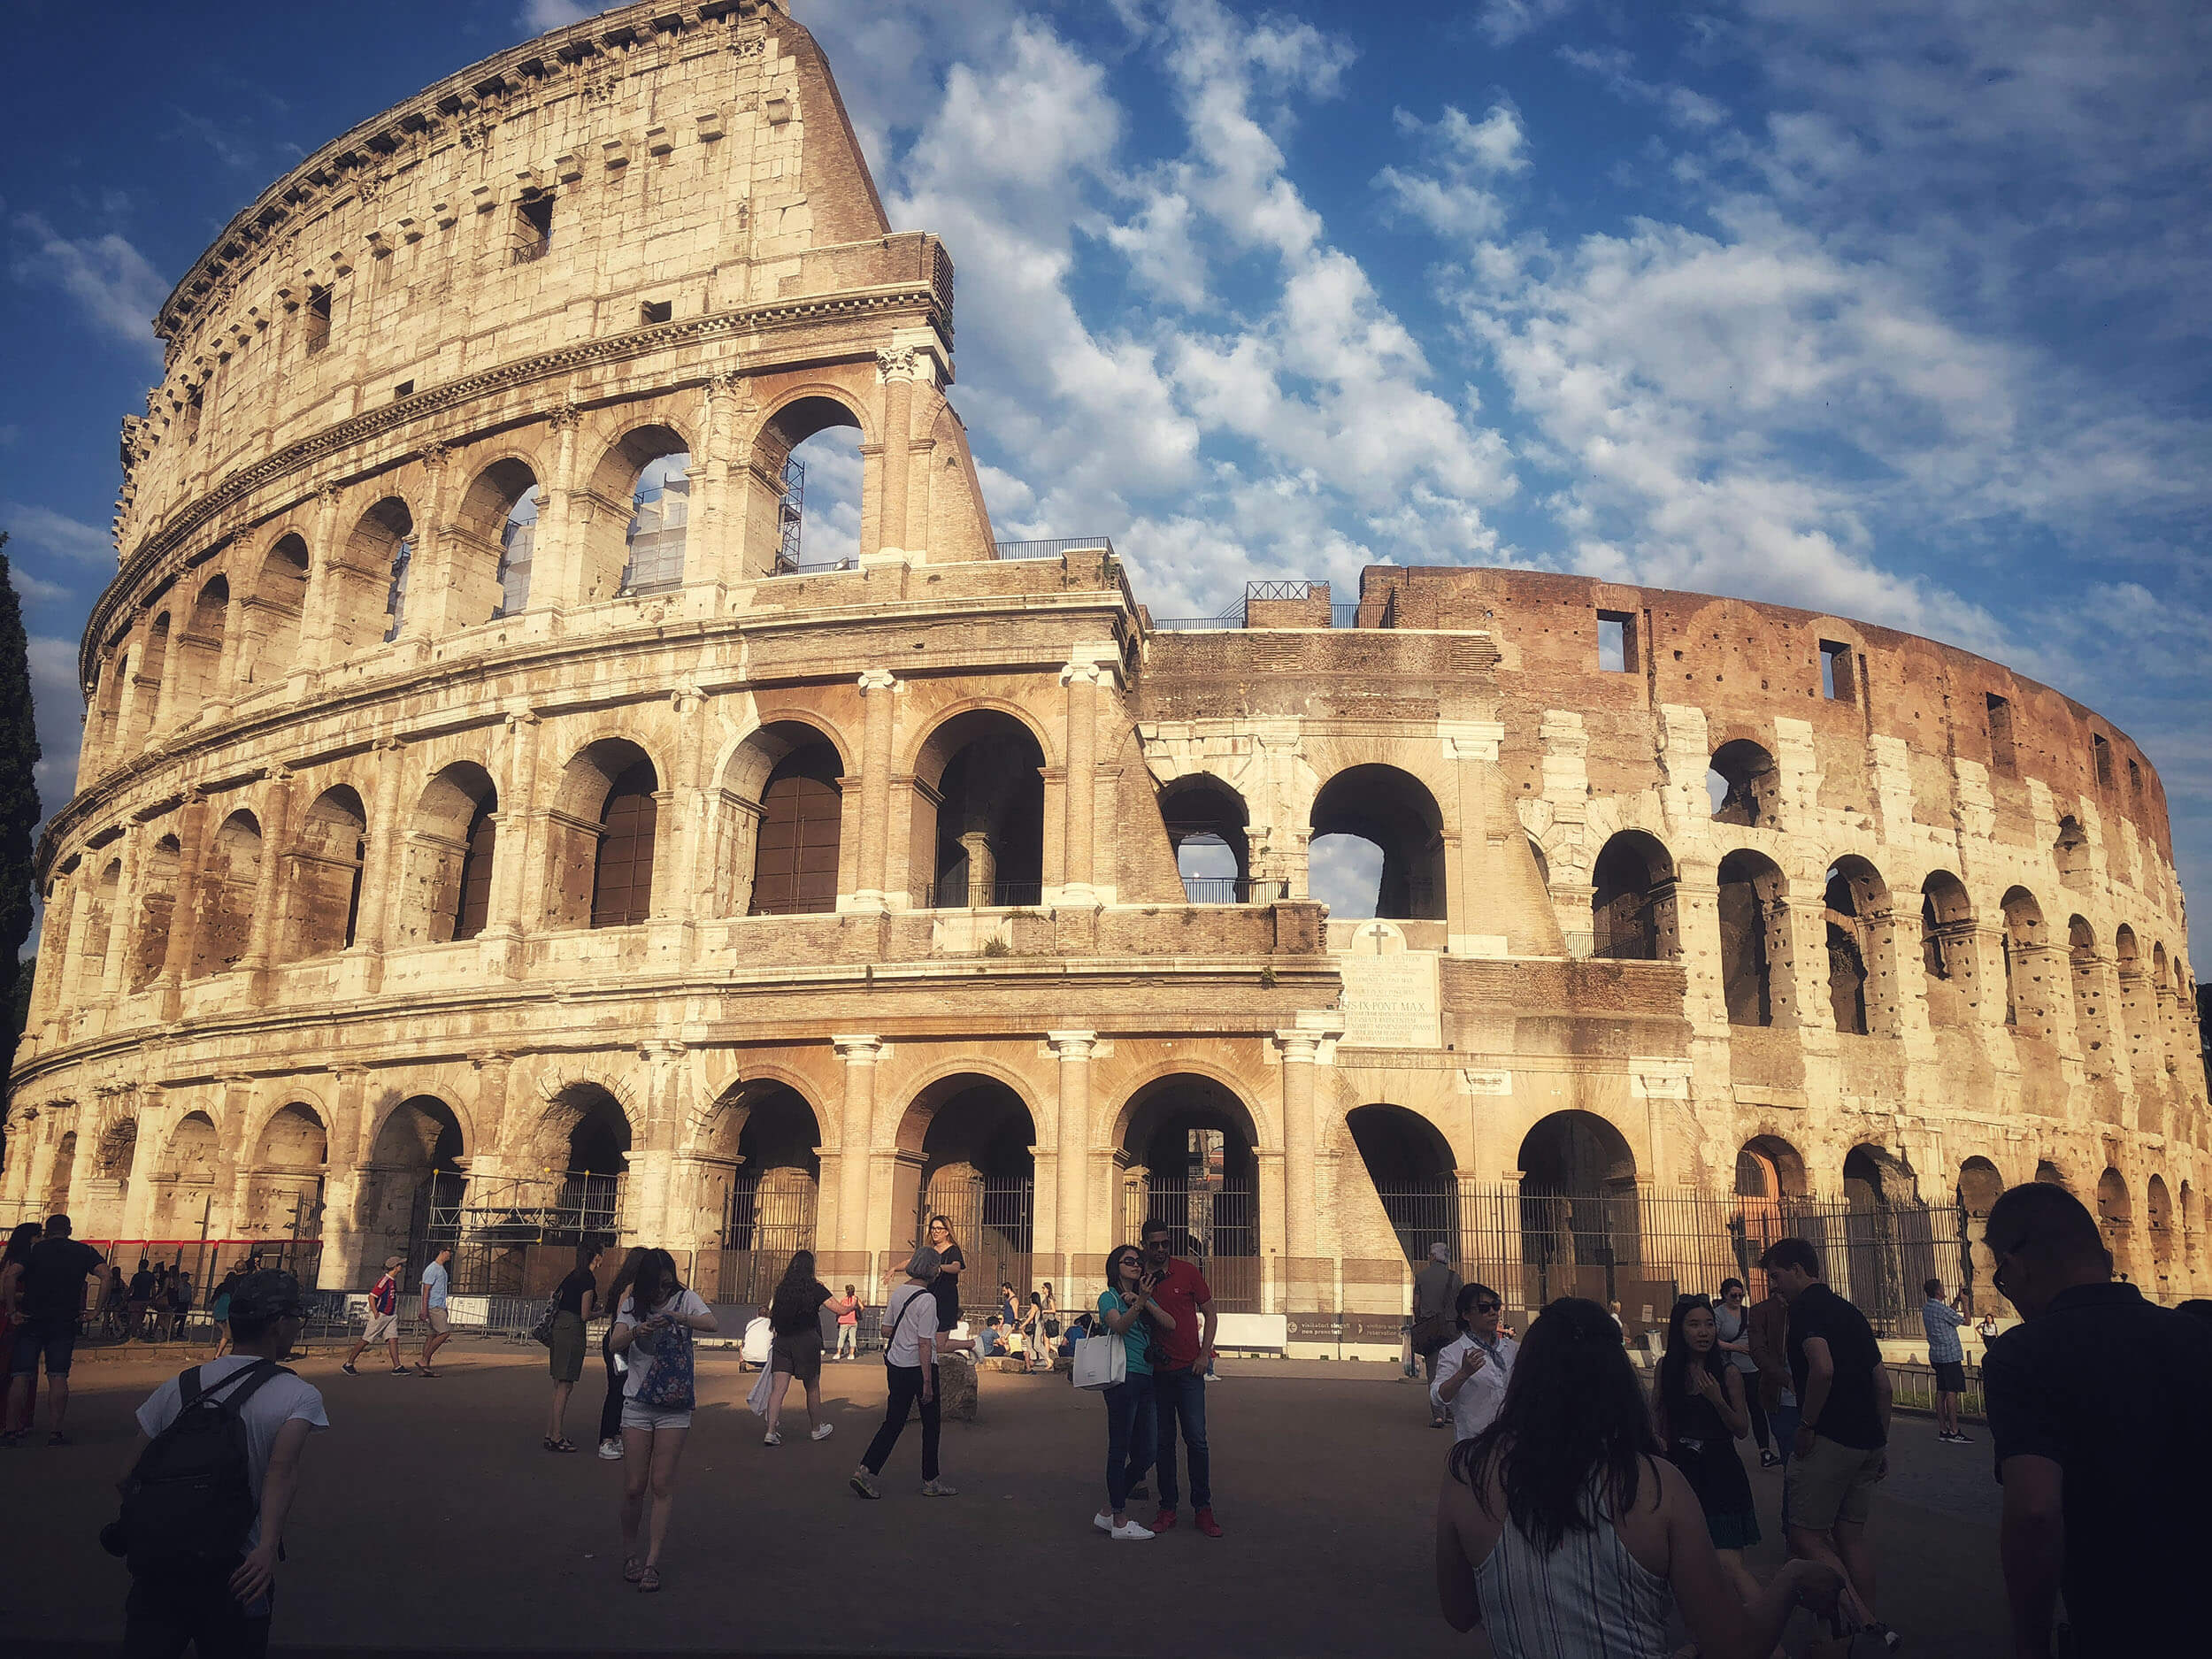 Mergeți și vizitați Roma!